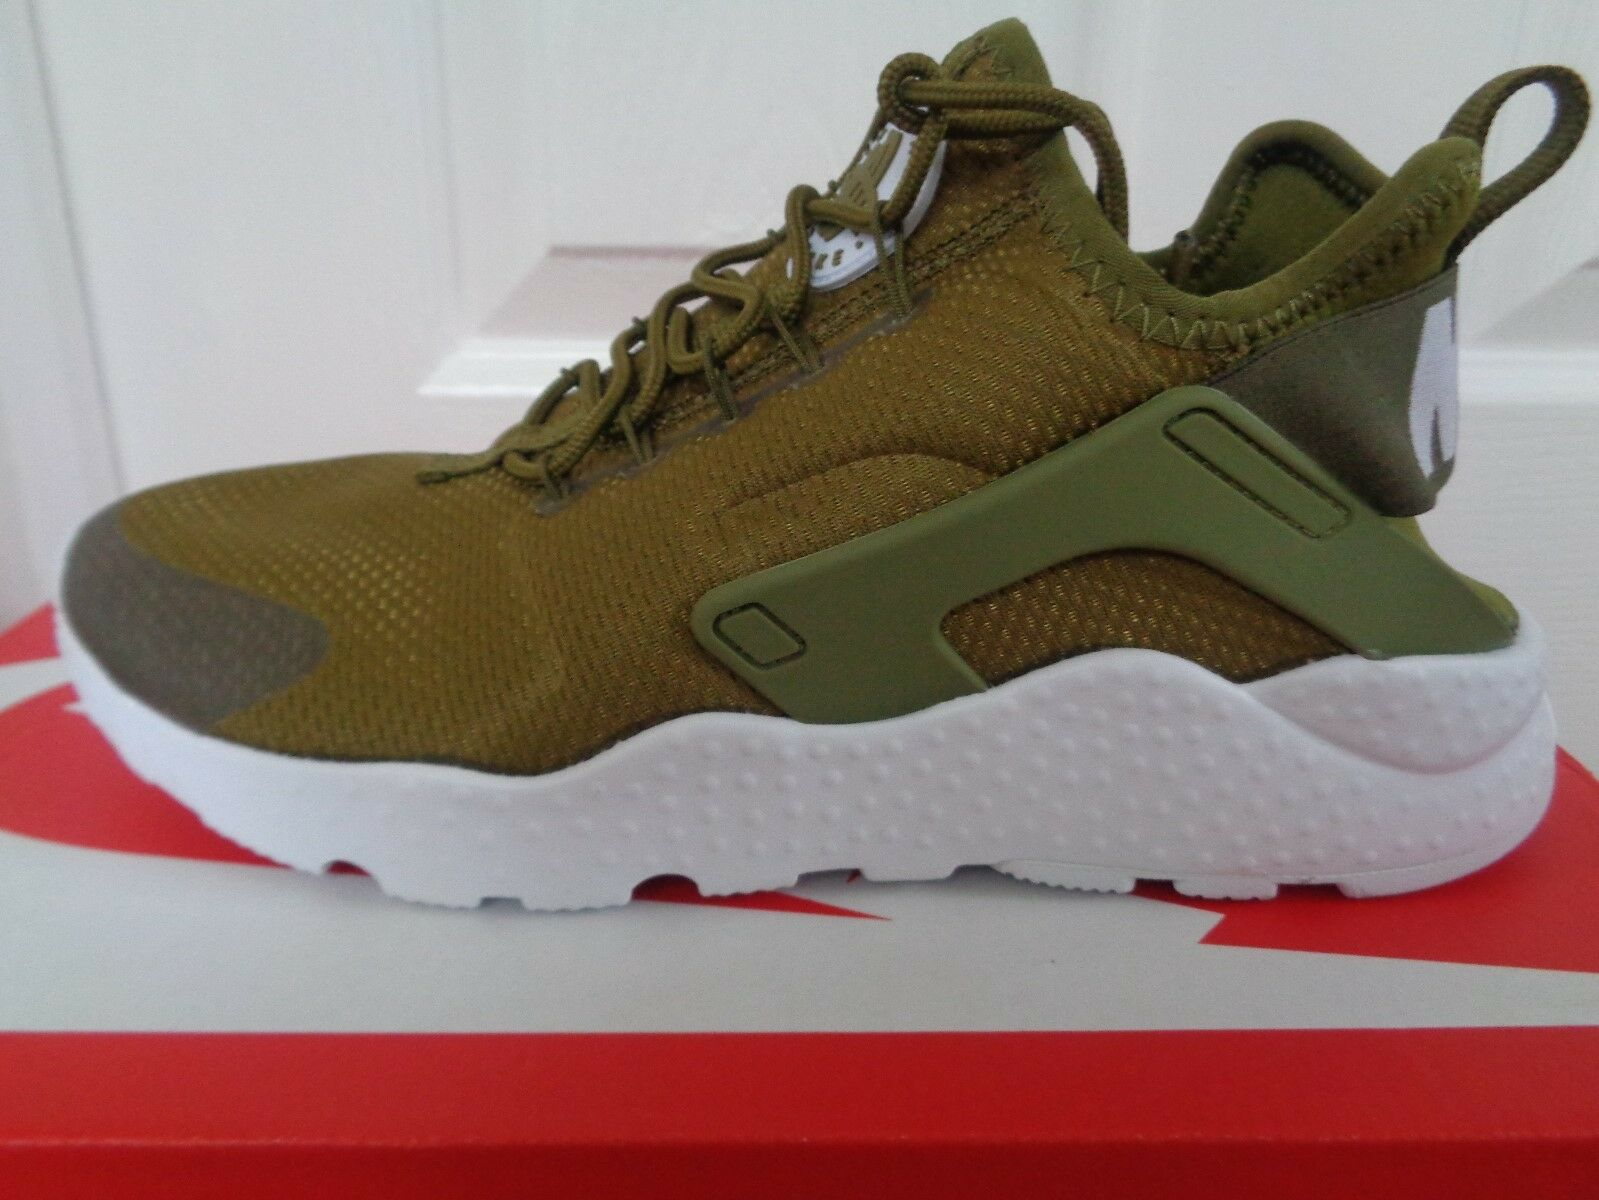 Nike Air Huarache Run Ultra Wmns Baskets 819151 302 UK 5.5 EU 39 US 8 Neuf + Boîte